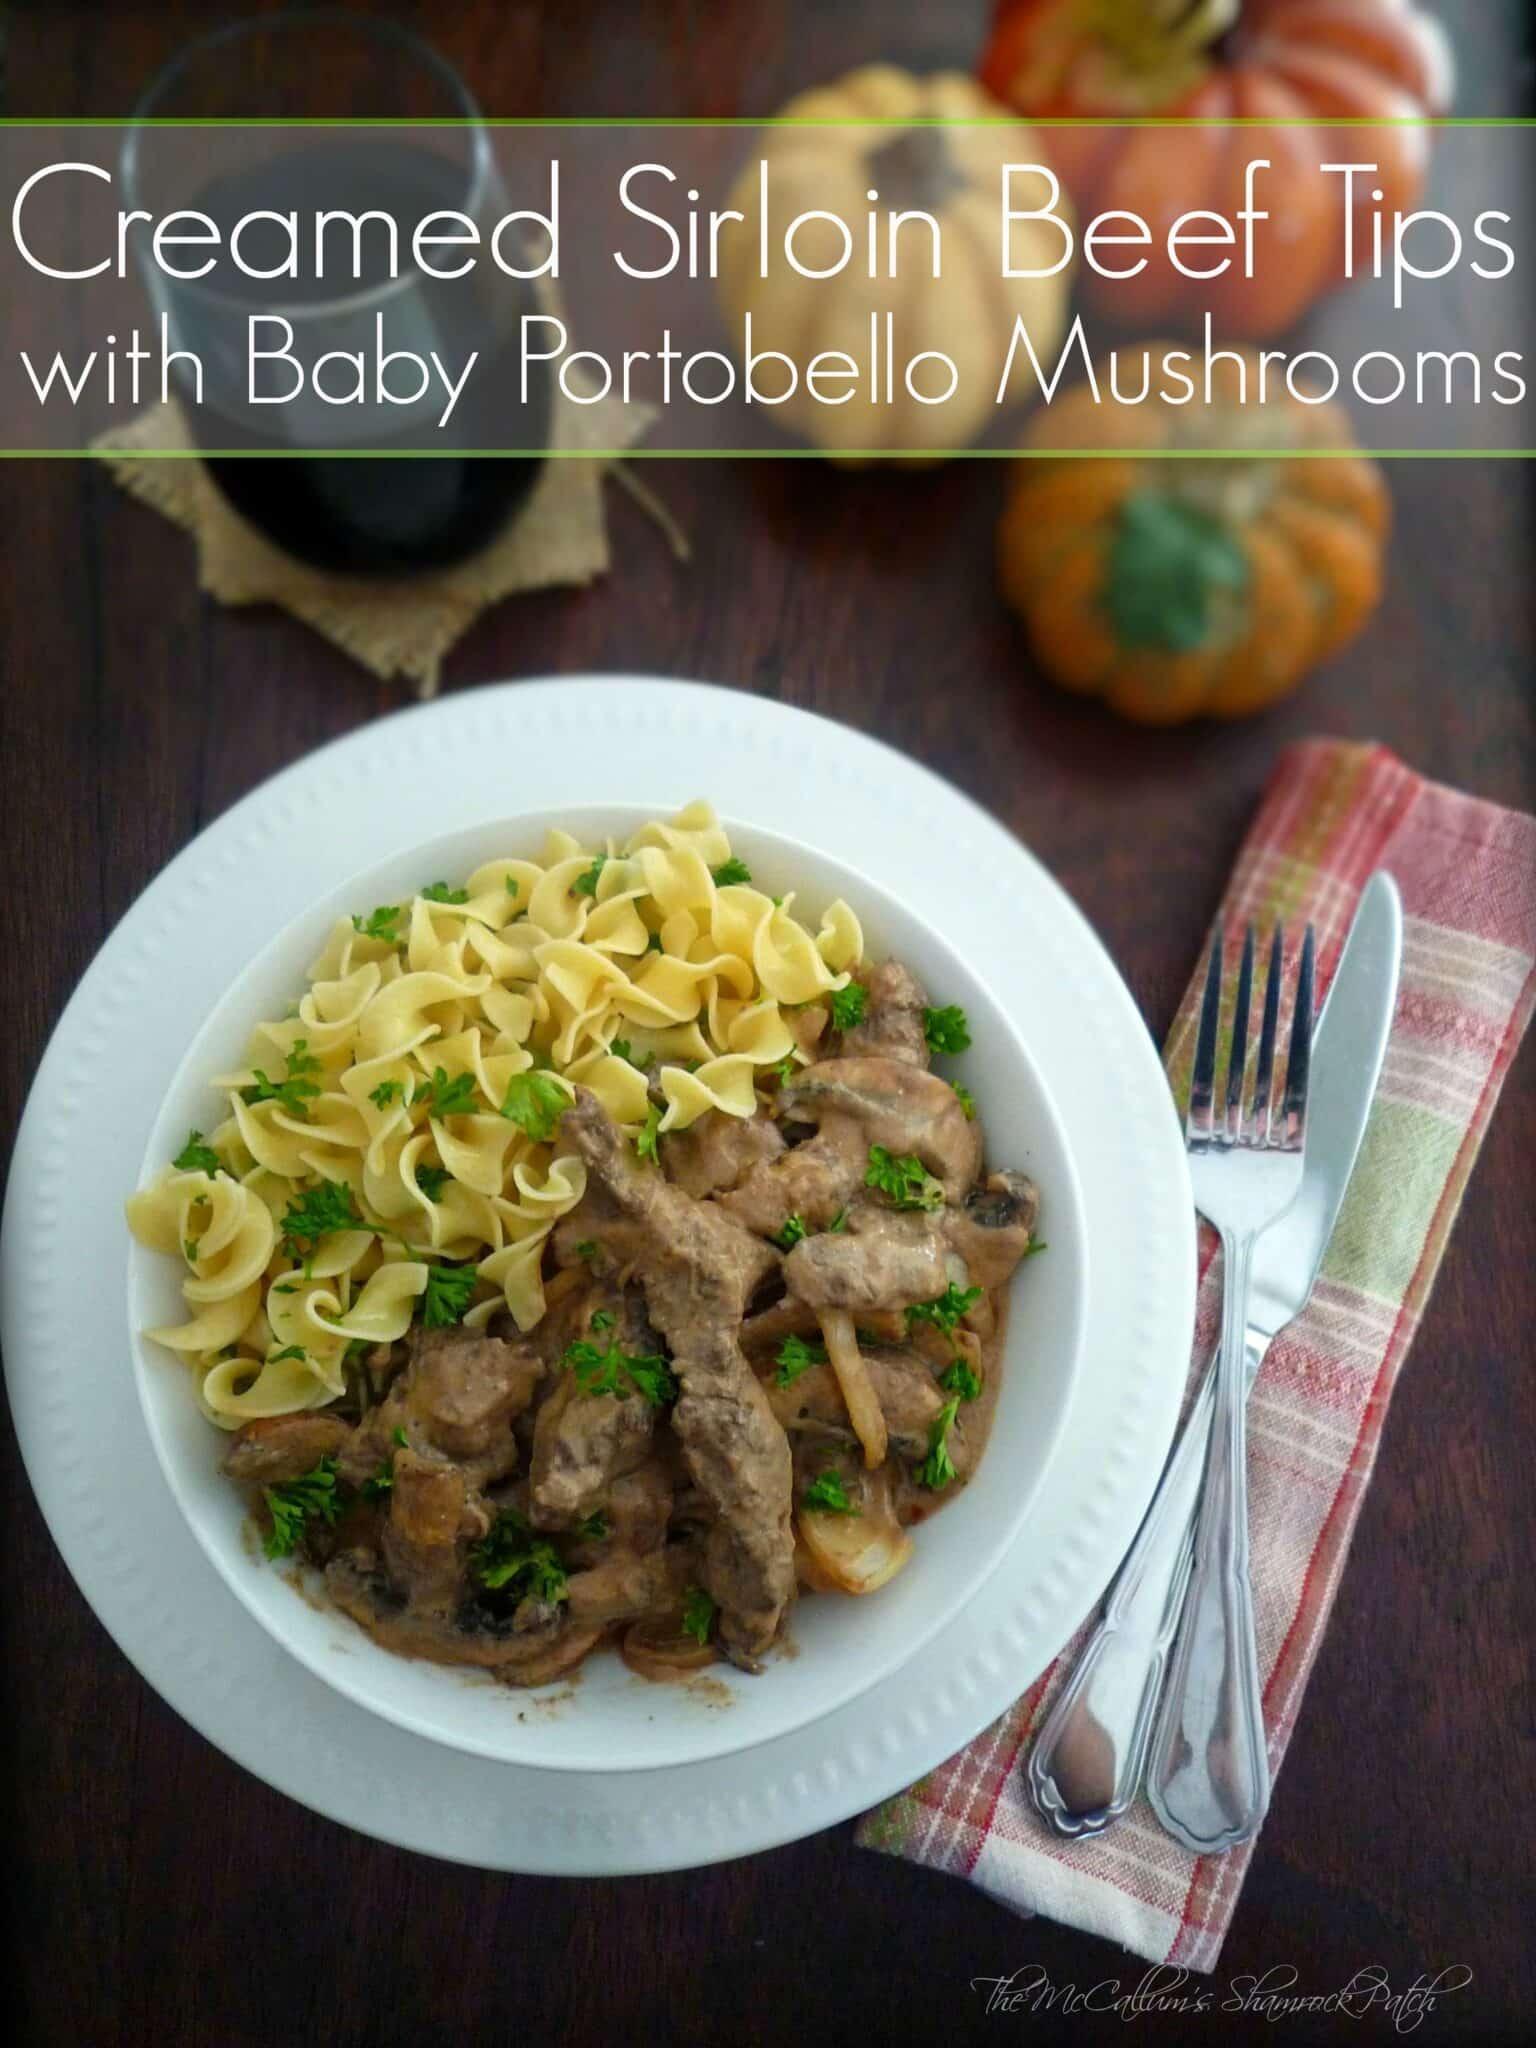 Creamed Sirloin Tips with Portobello Mushrooms